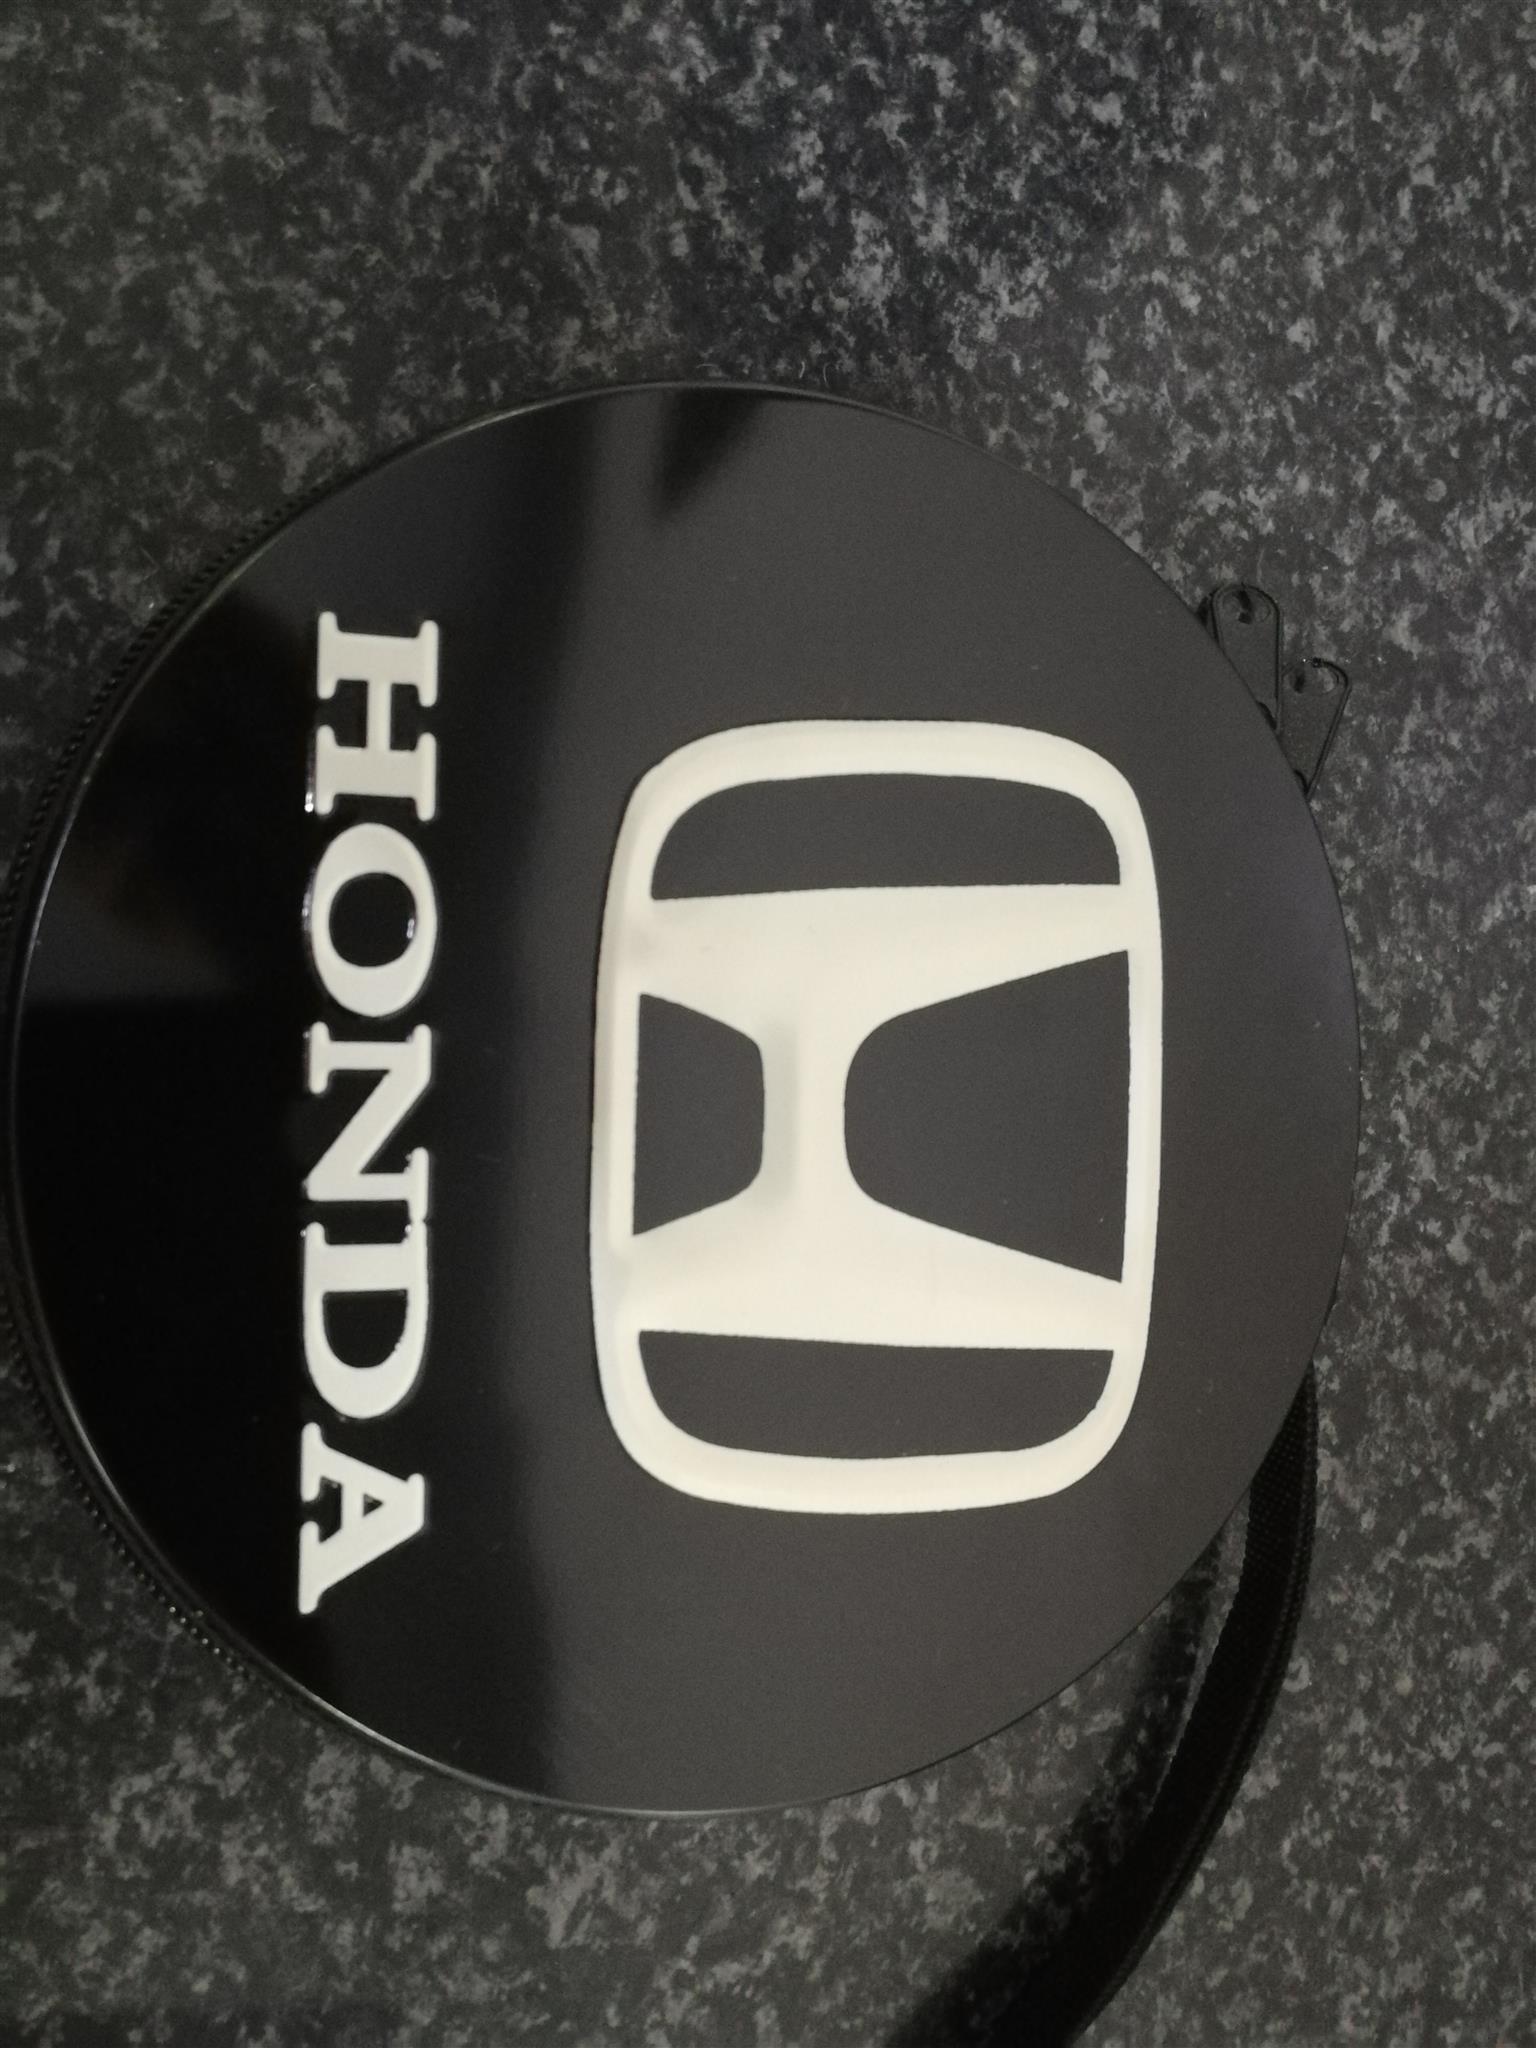 Watch With Honda Logo and Honda 24 Dvd Disc Holder